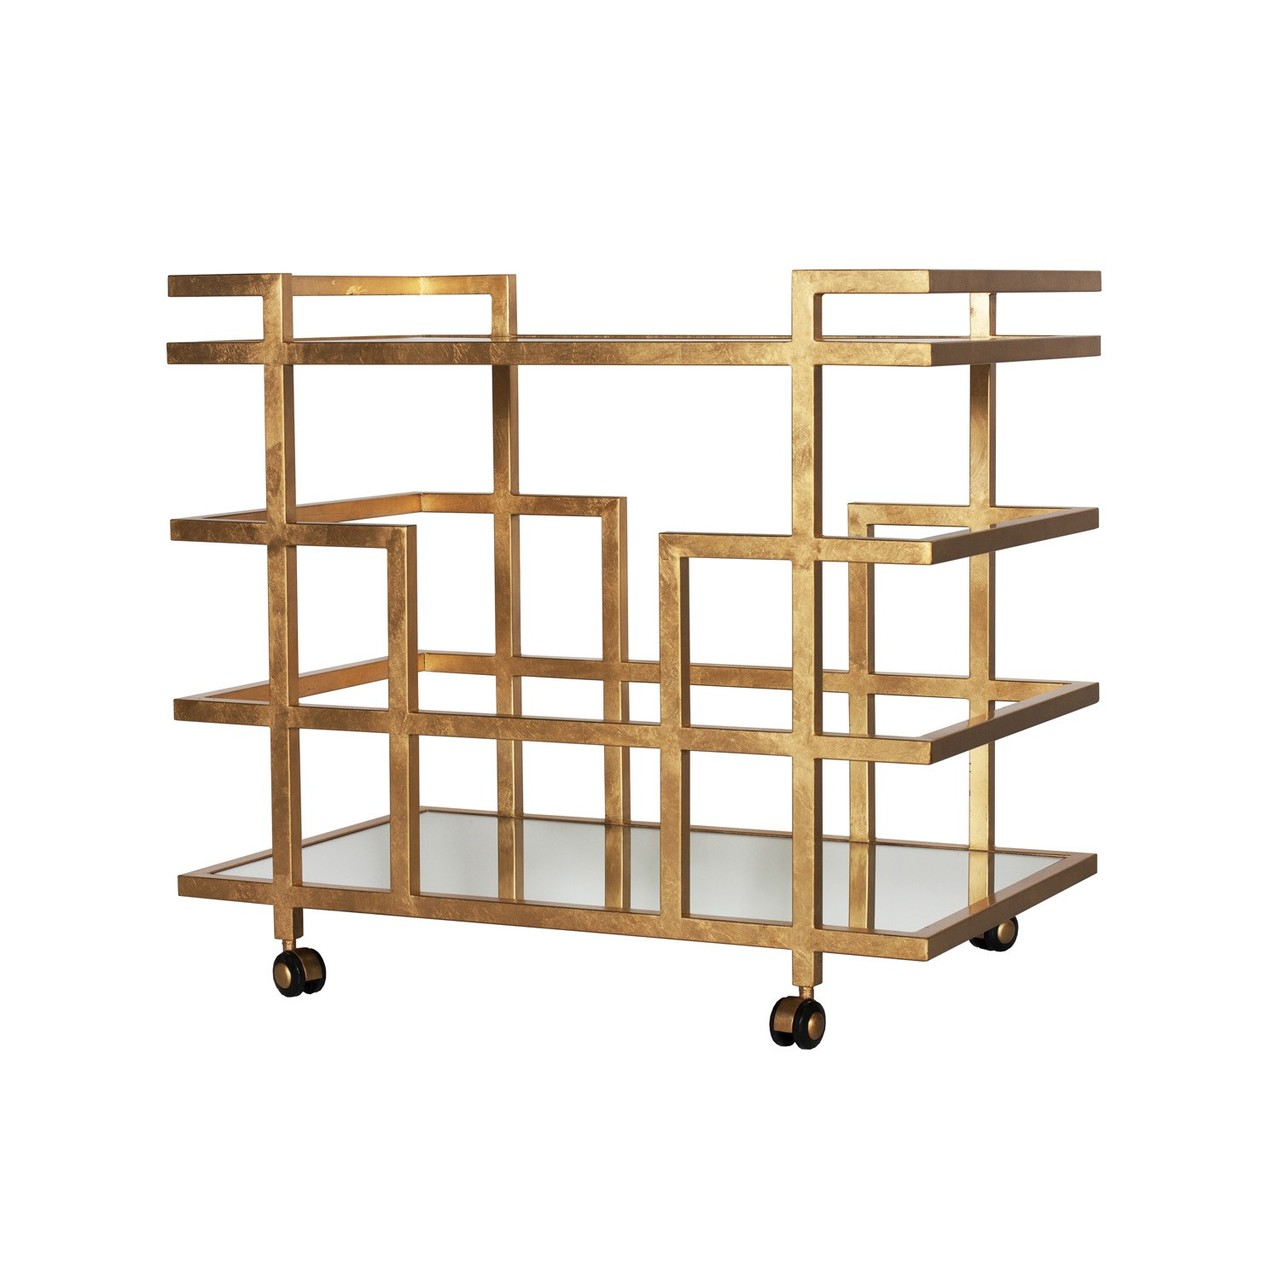 worlds away ireland gold leaf linear bar cart with mirror. Black Bedroom Furniture Sets. Home Design Ideas